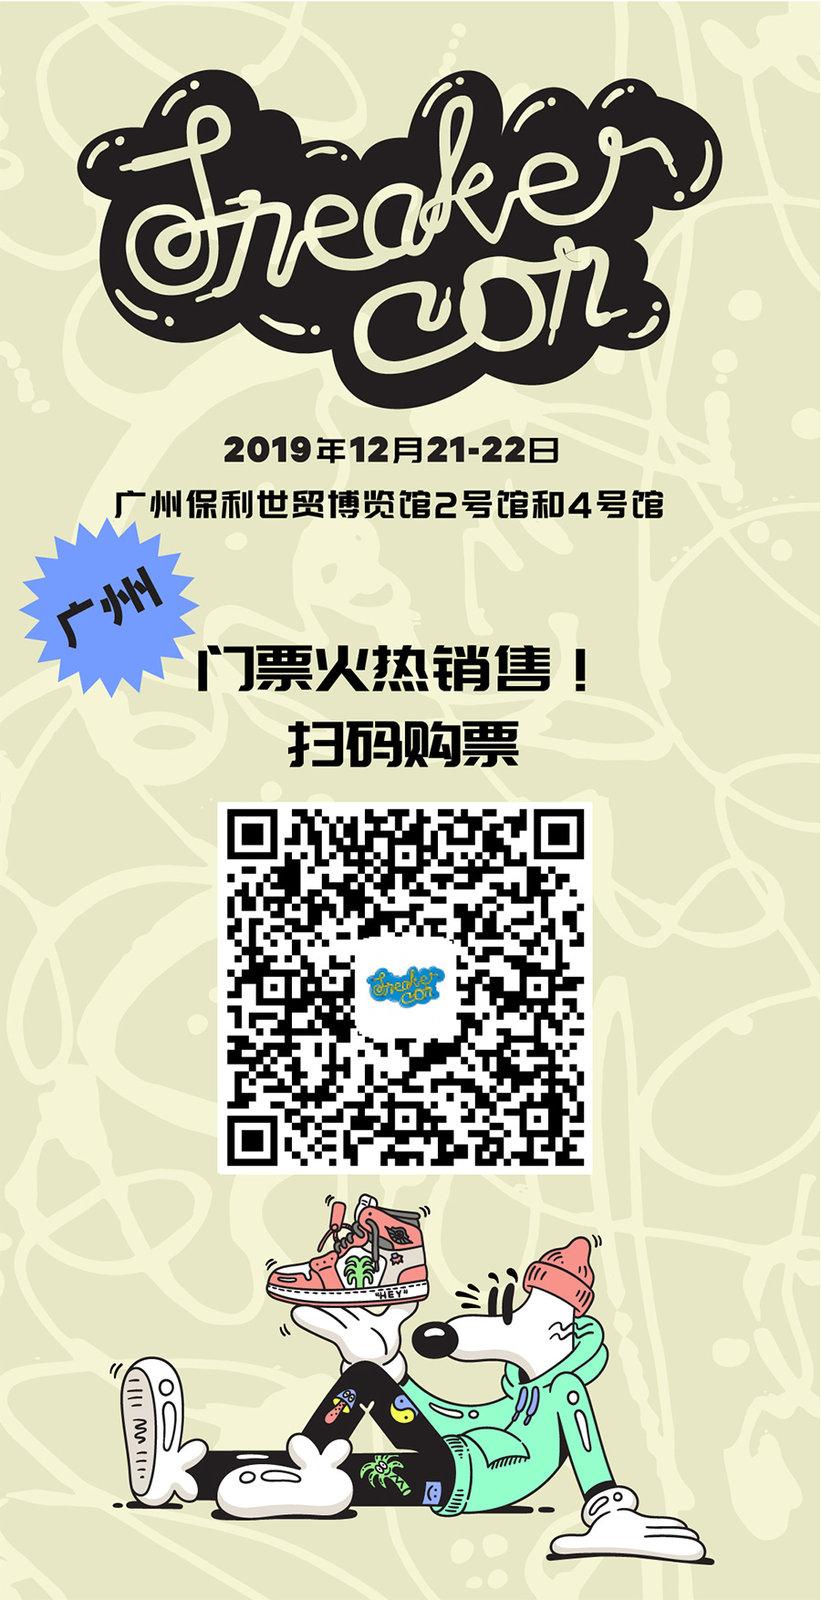 Sneaker Con,SneakerCon 鞋迷盛会 Sneaker Con 广州站来了!限量早鸟票刚刚开抢!